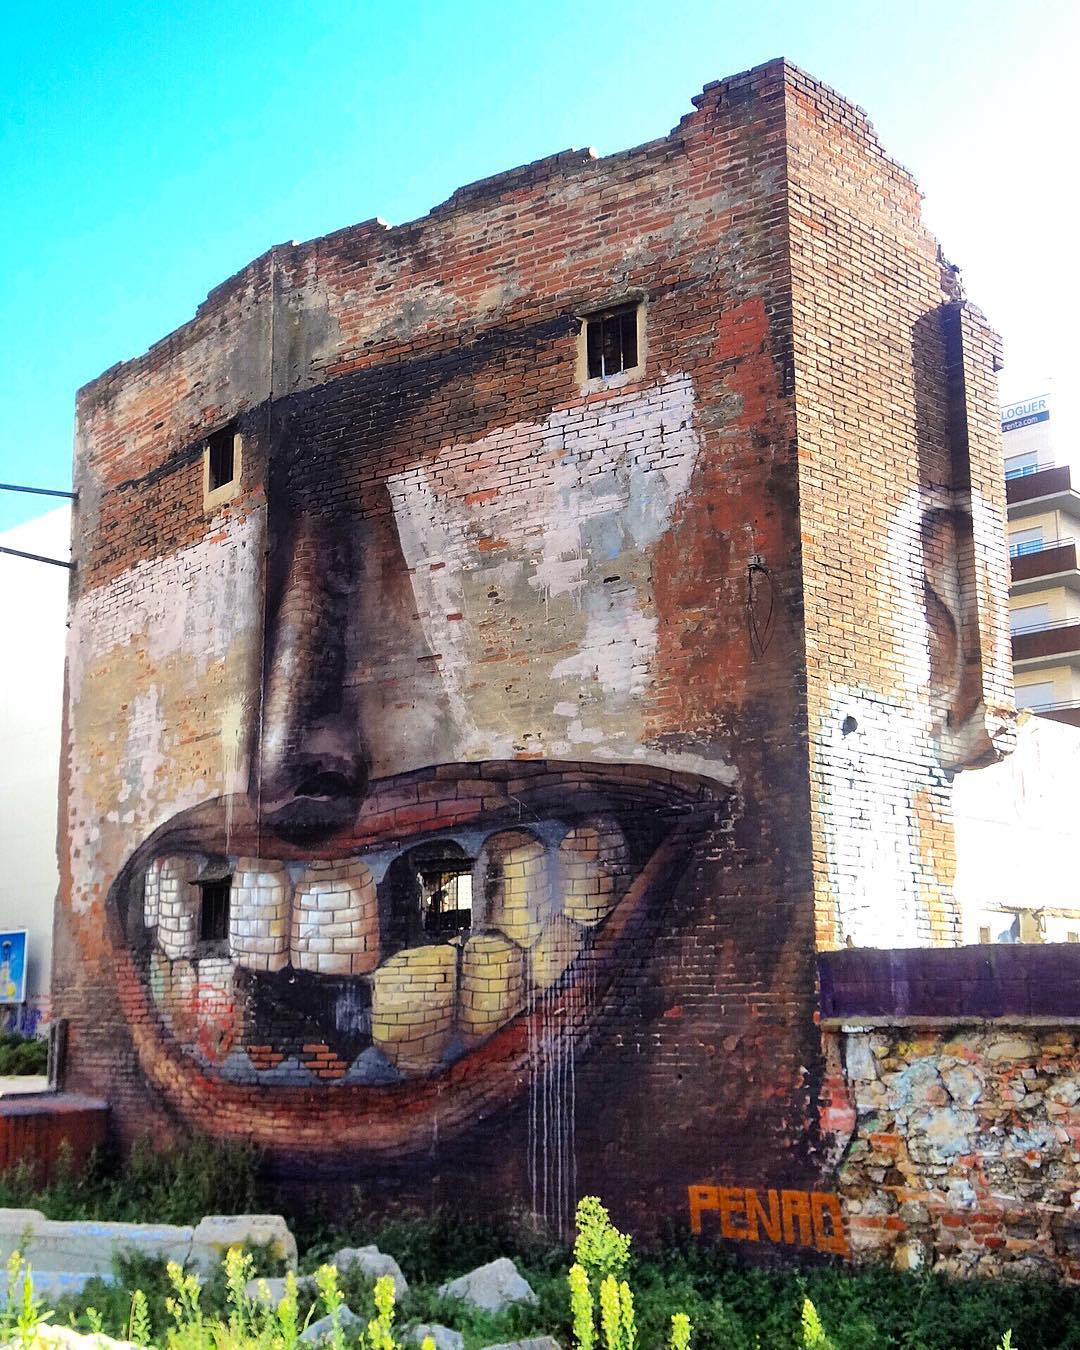 casa-sorridente-street-art-street-artist-penao-murs-lliures-barcellona-1